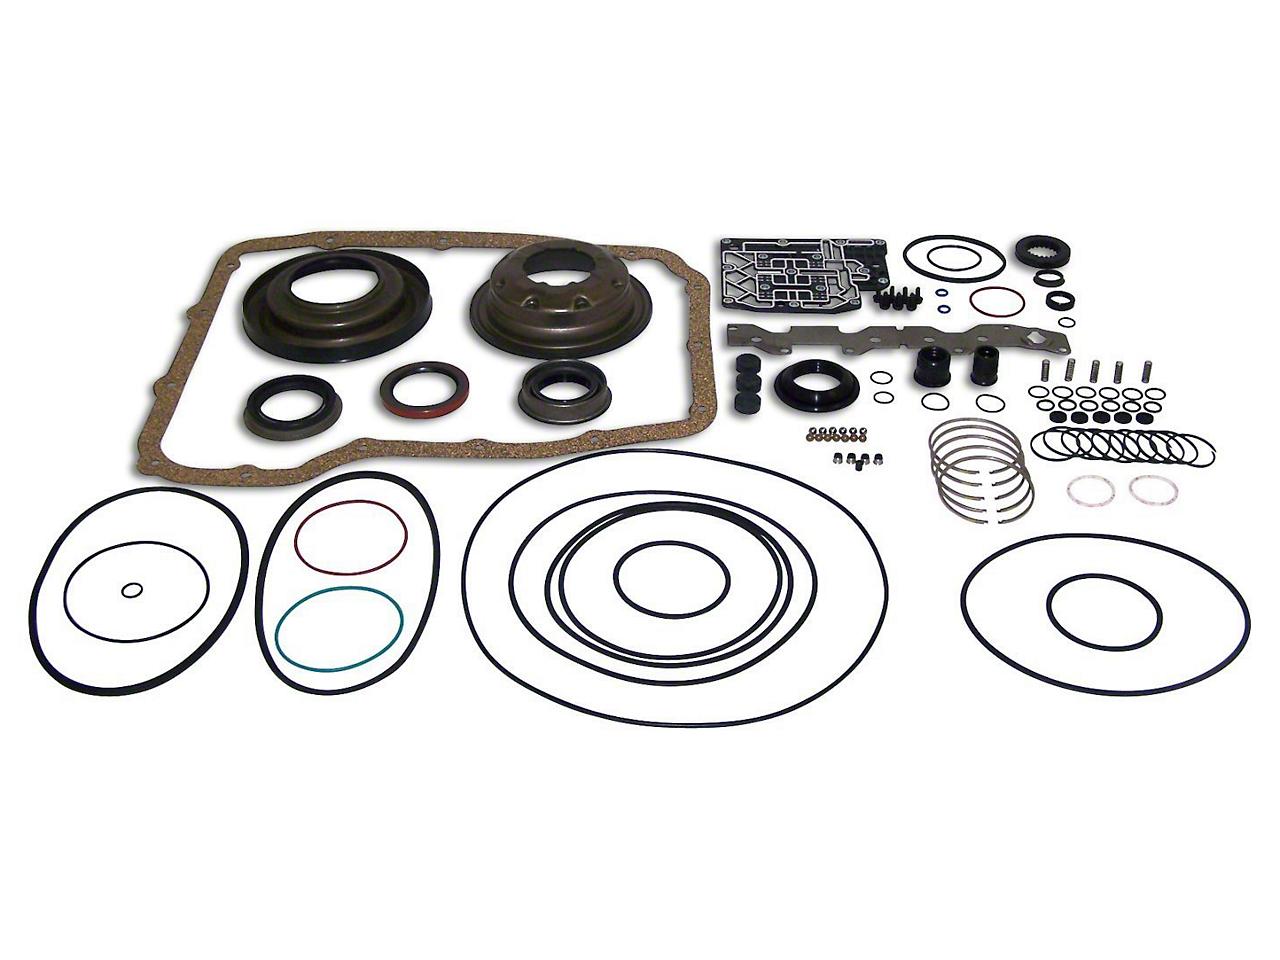 Crown Automotive 545RFE Transmission Overhaul Kit (2007 Wrangler JK)